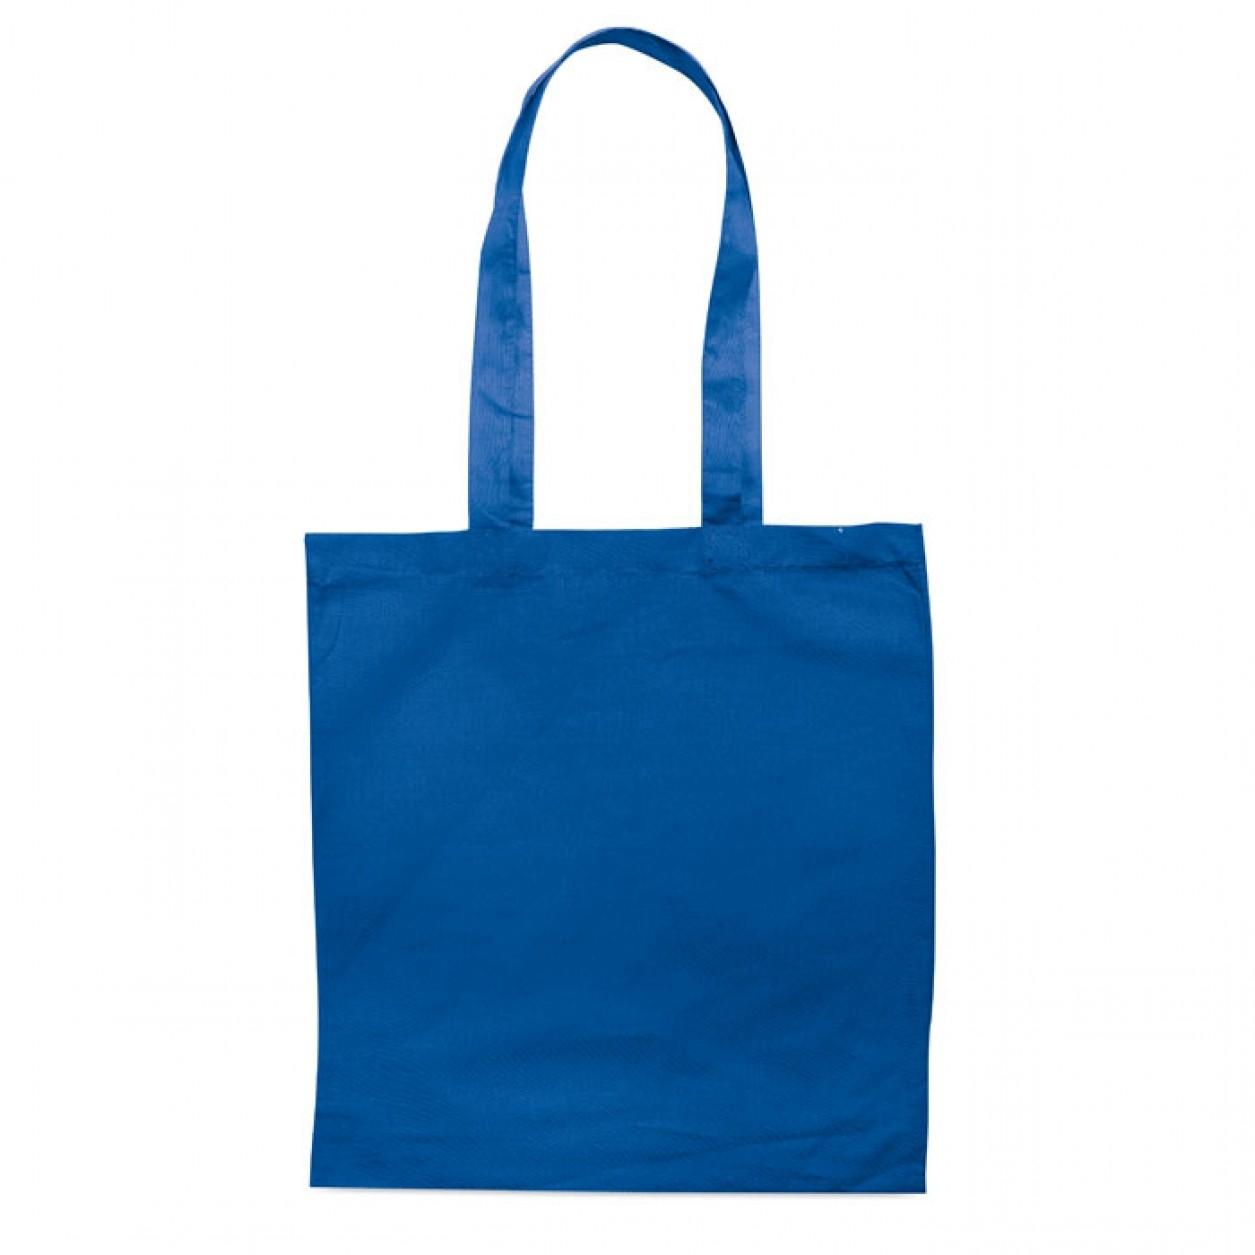 Printed Gift Bags Wholesale Printkick